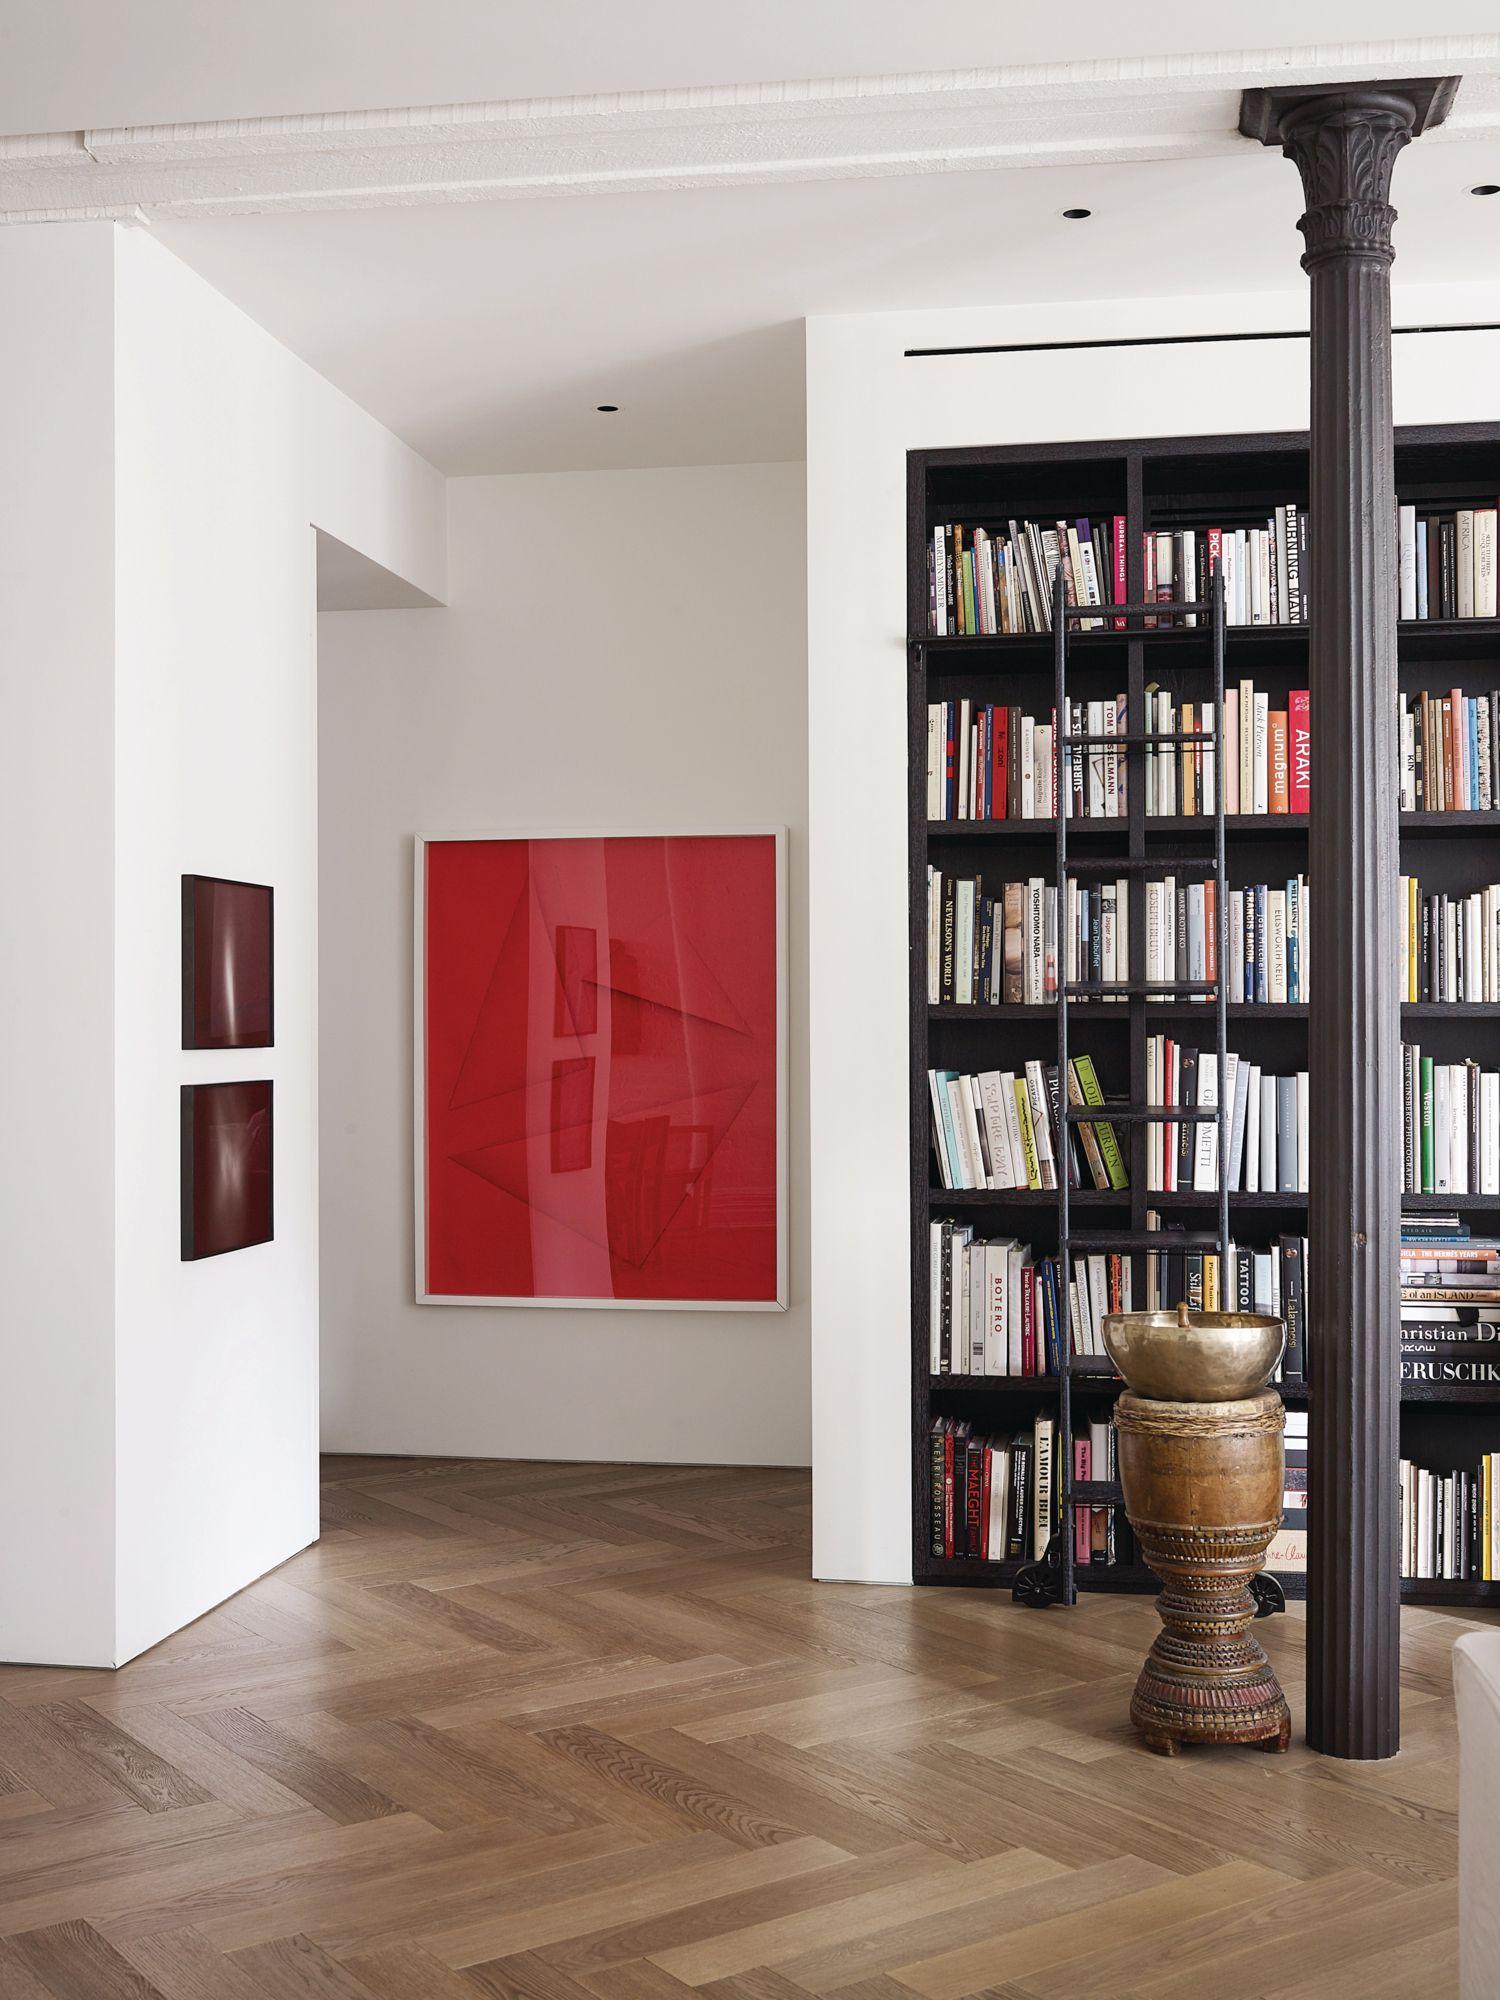 在 Phillip Lim 豐富的藝術書籍收藏旁有兩張由 N Dash 拍攝的照片《Untitled》(2009),以及一幅由 Marine Hugonnier 創作的拼貼作品《Modele 12L》(2010)。(Photo: Wichmann + Bendtsen for Tatler Hong Kong)